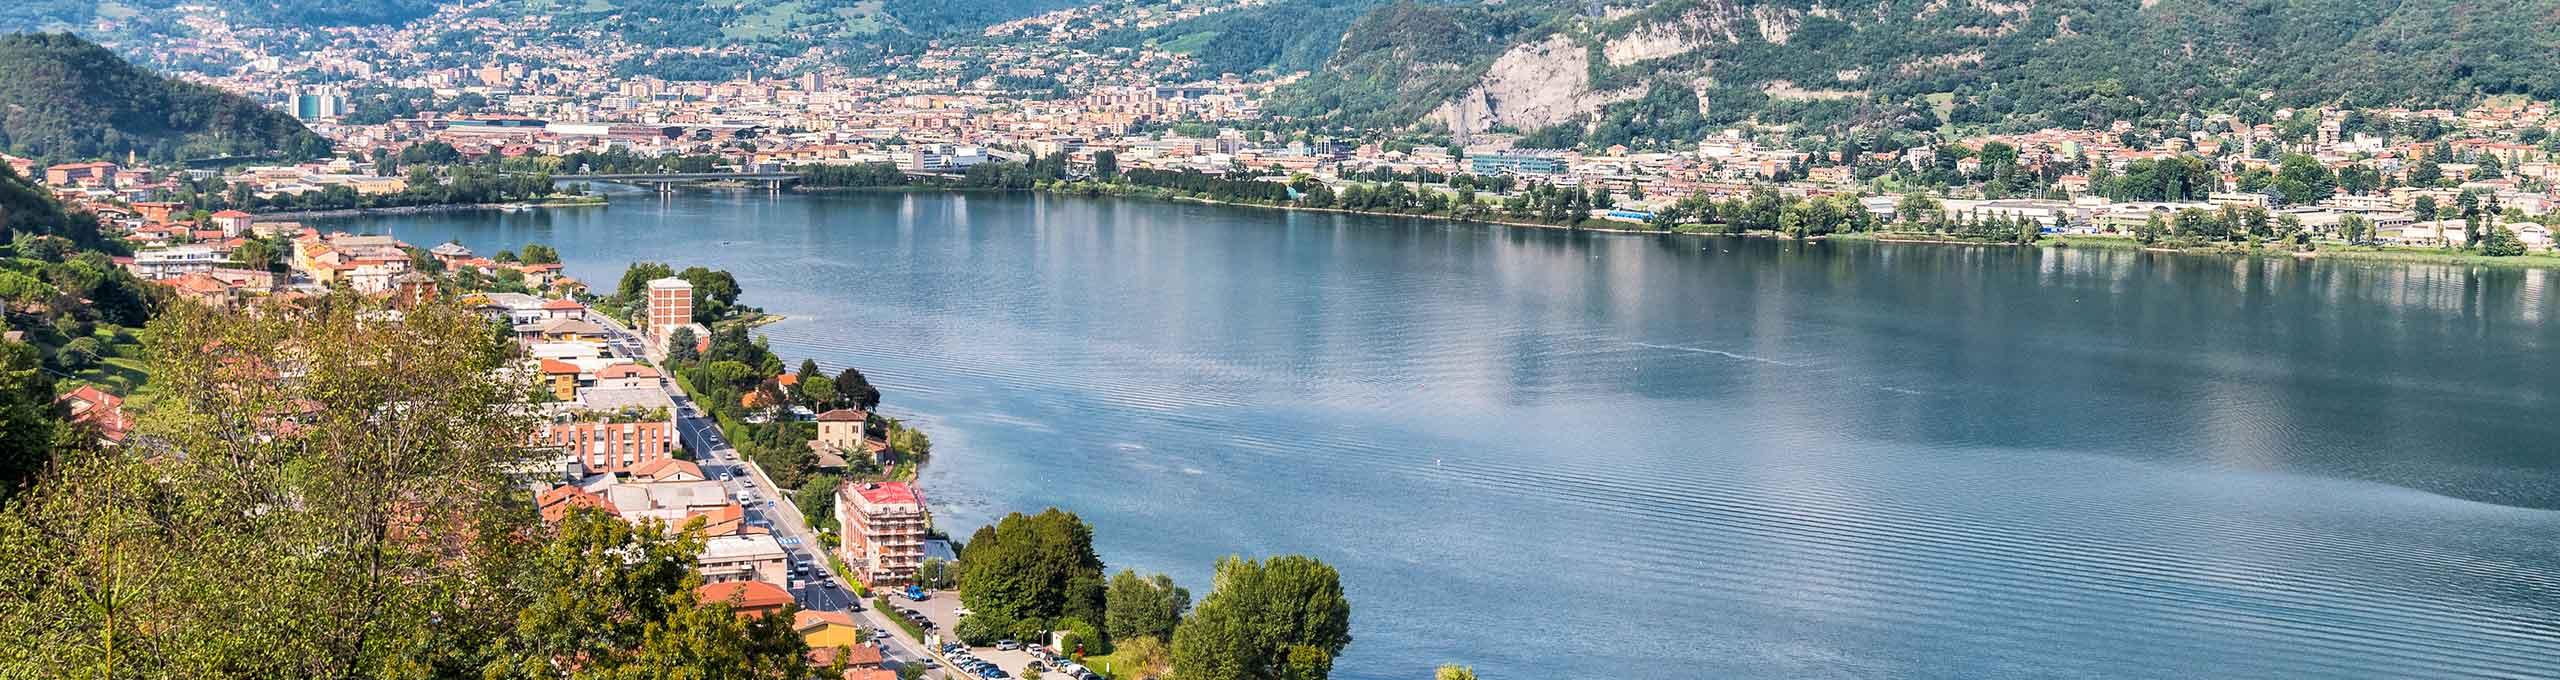 Garlate, Lago di Como, Lecco